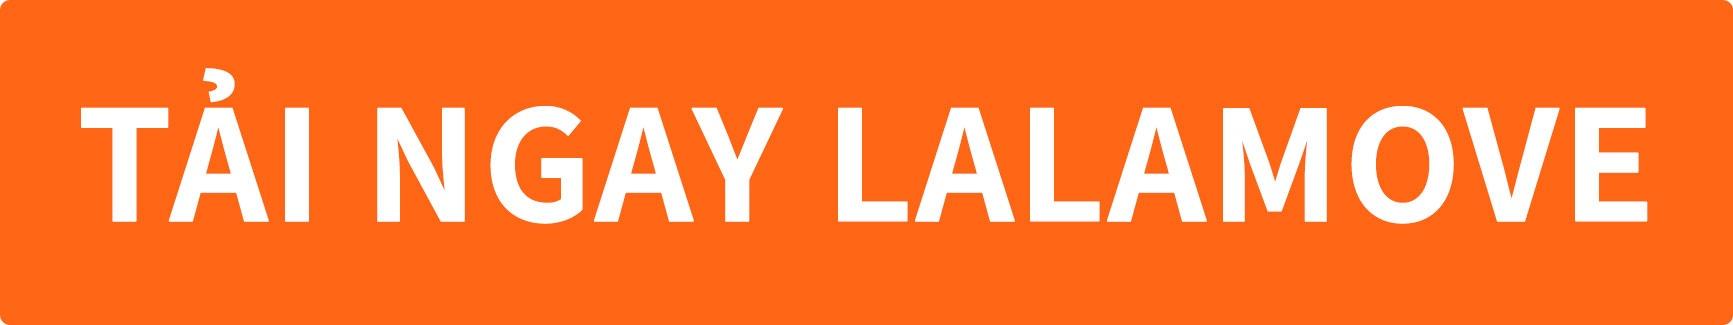 CTA-DOWNLOAD-LALAMOVE.jpg